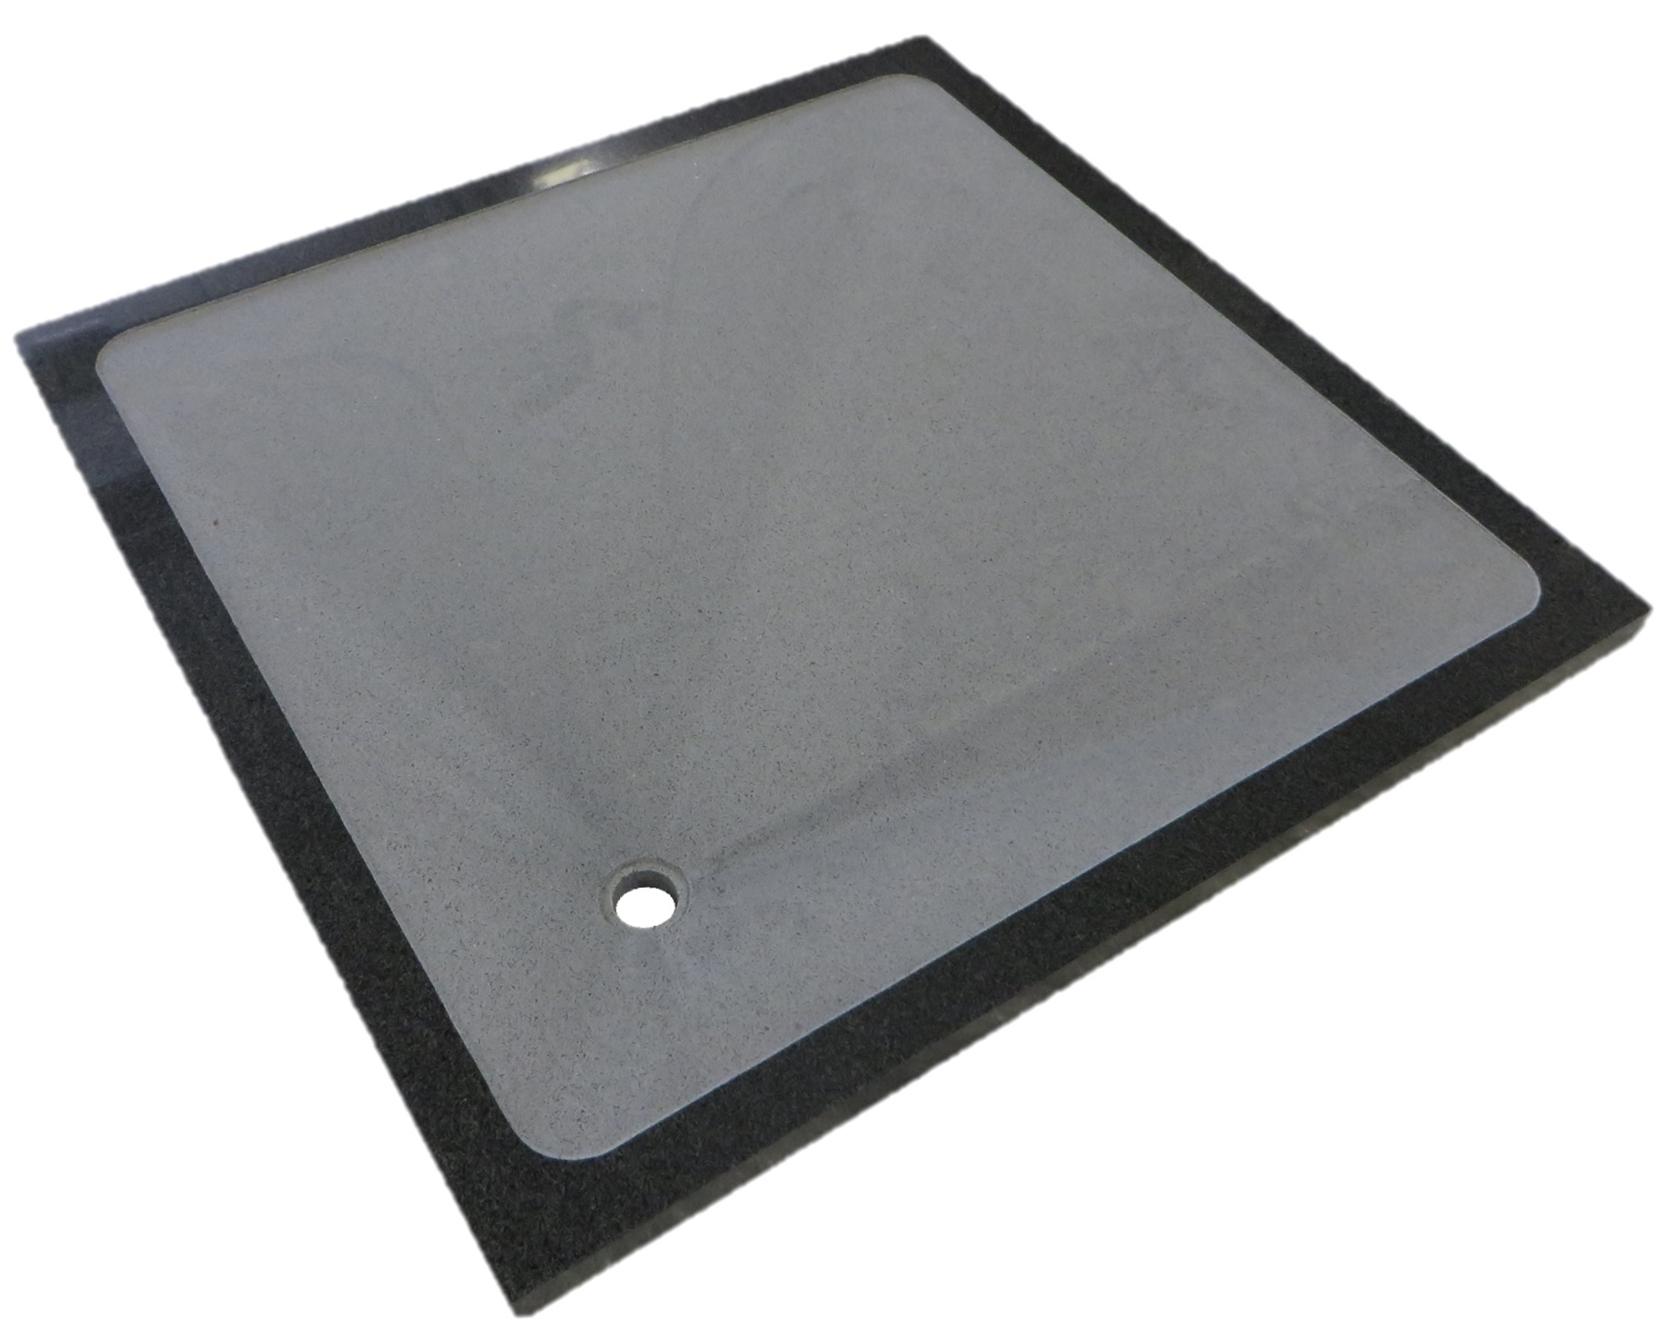 duschtasse duschtasse ebenerdig liebenswert flache. Black Bedroom Furniture Sets. Home Design Ideas